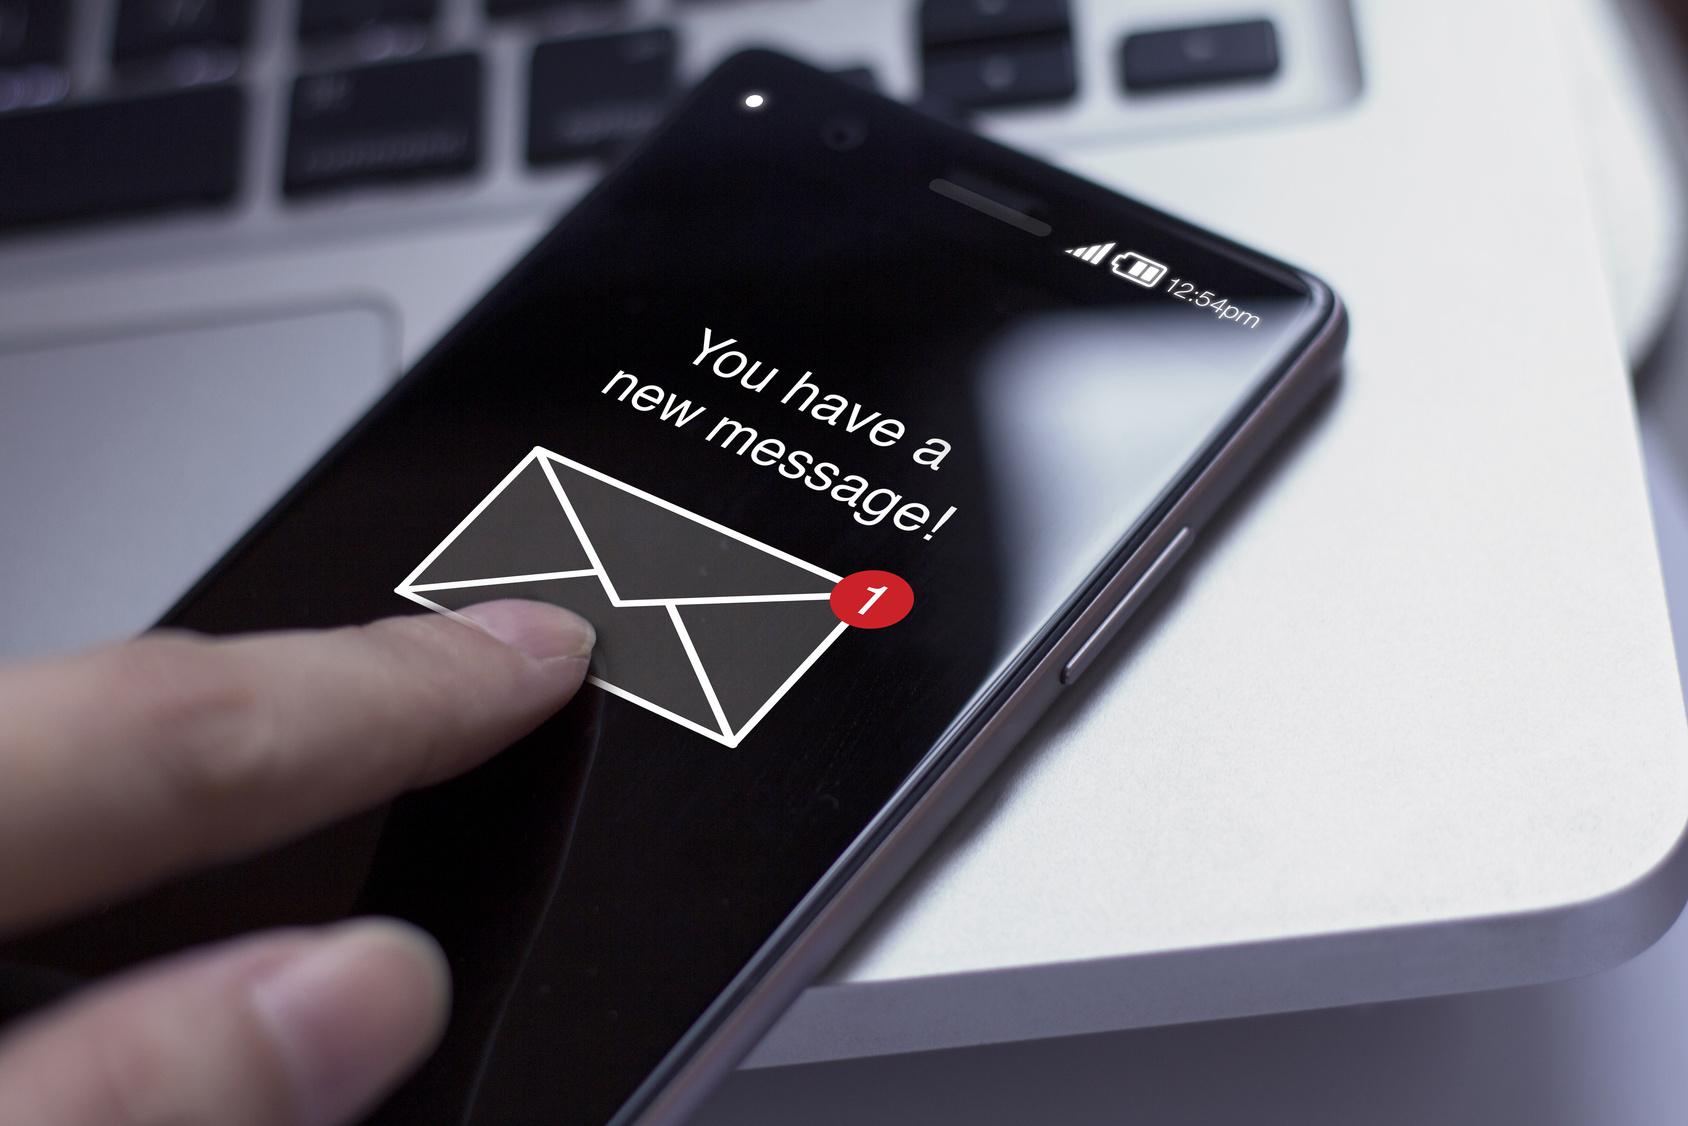 SMS lead generation